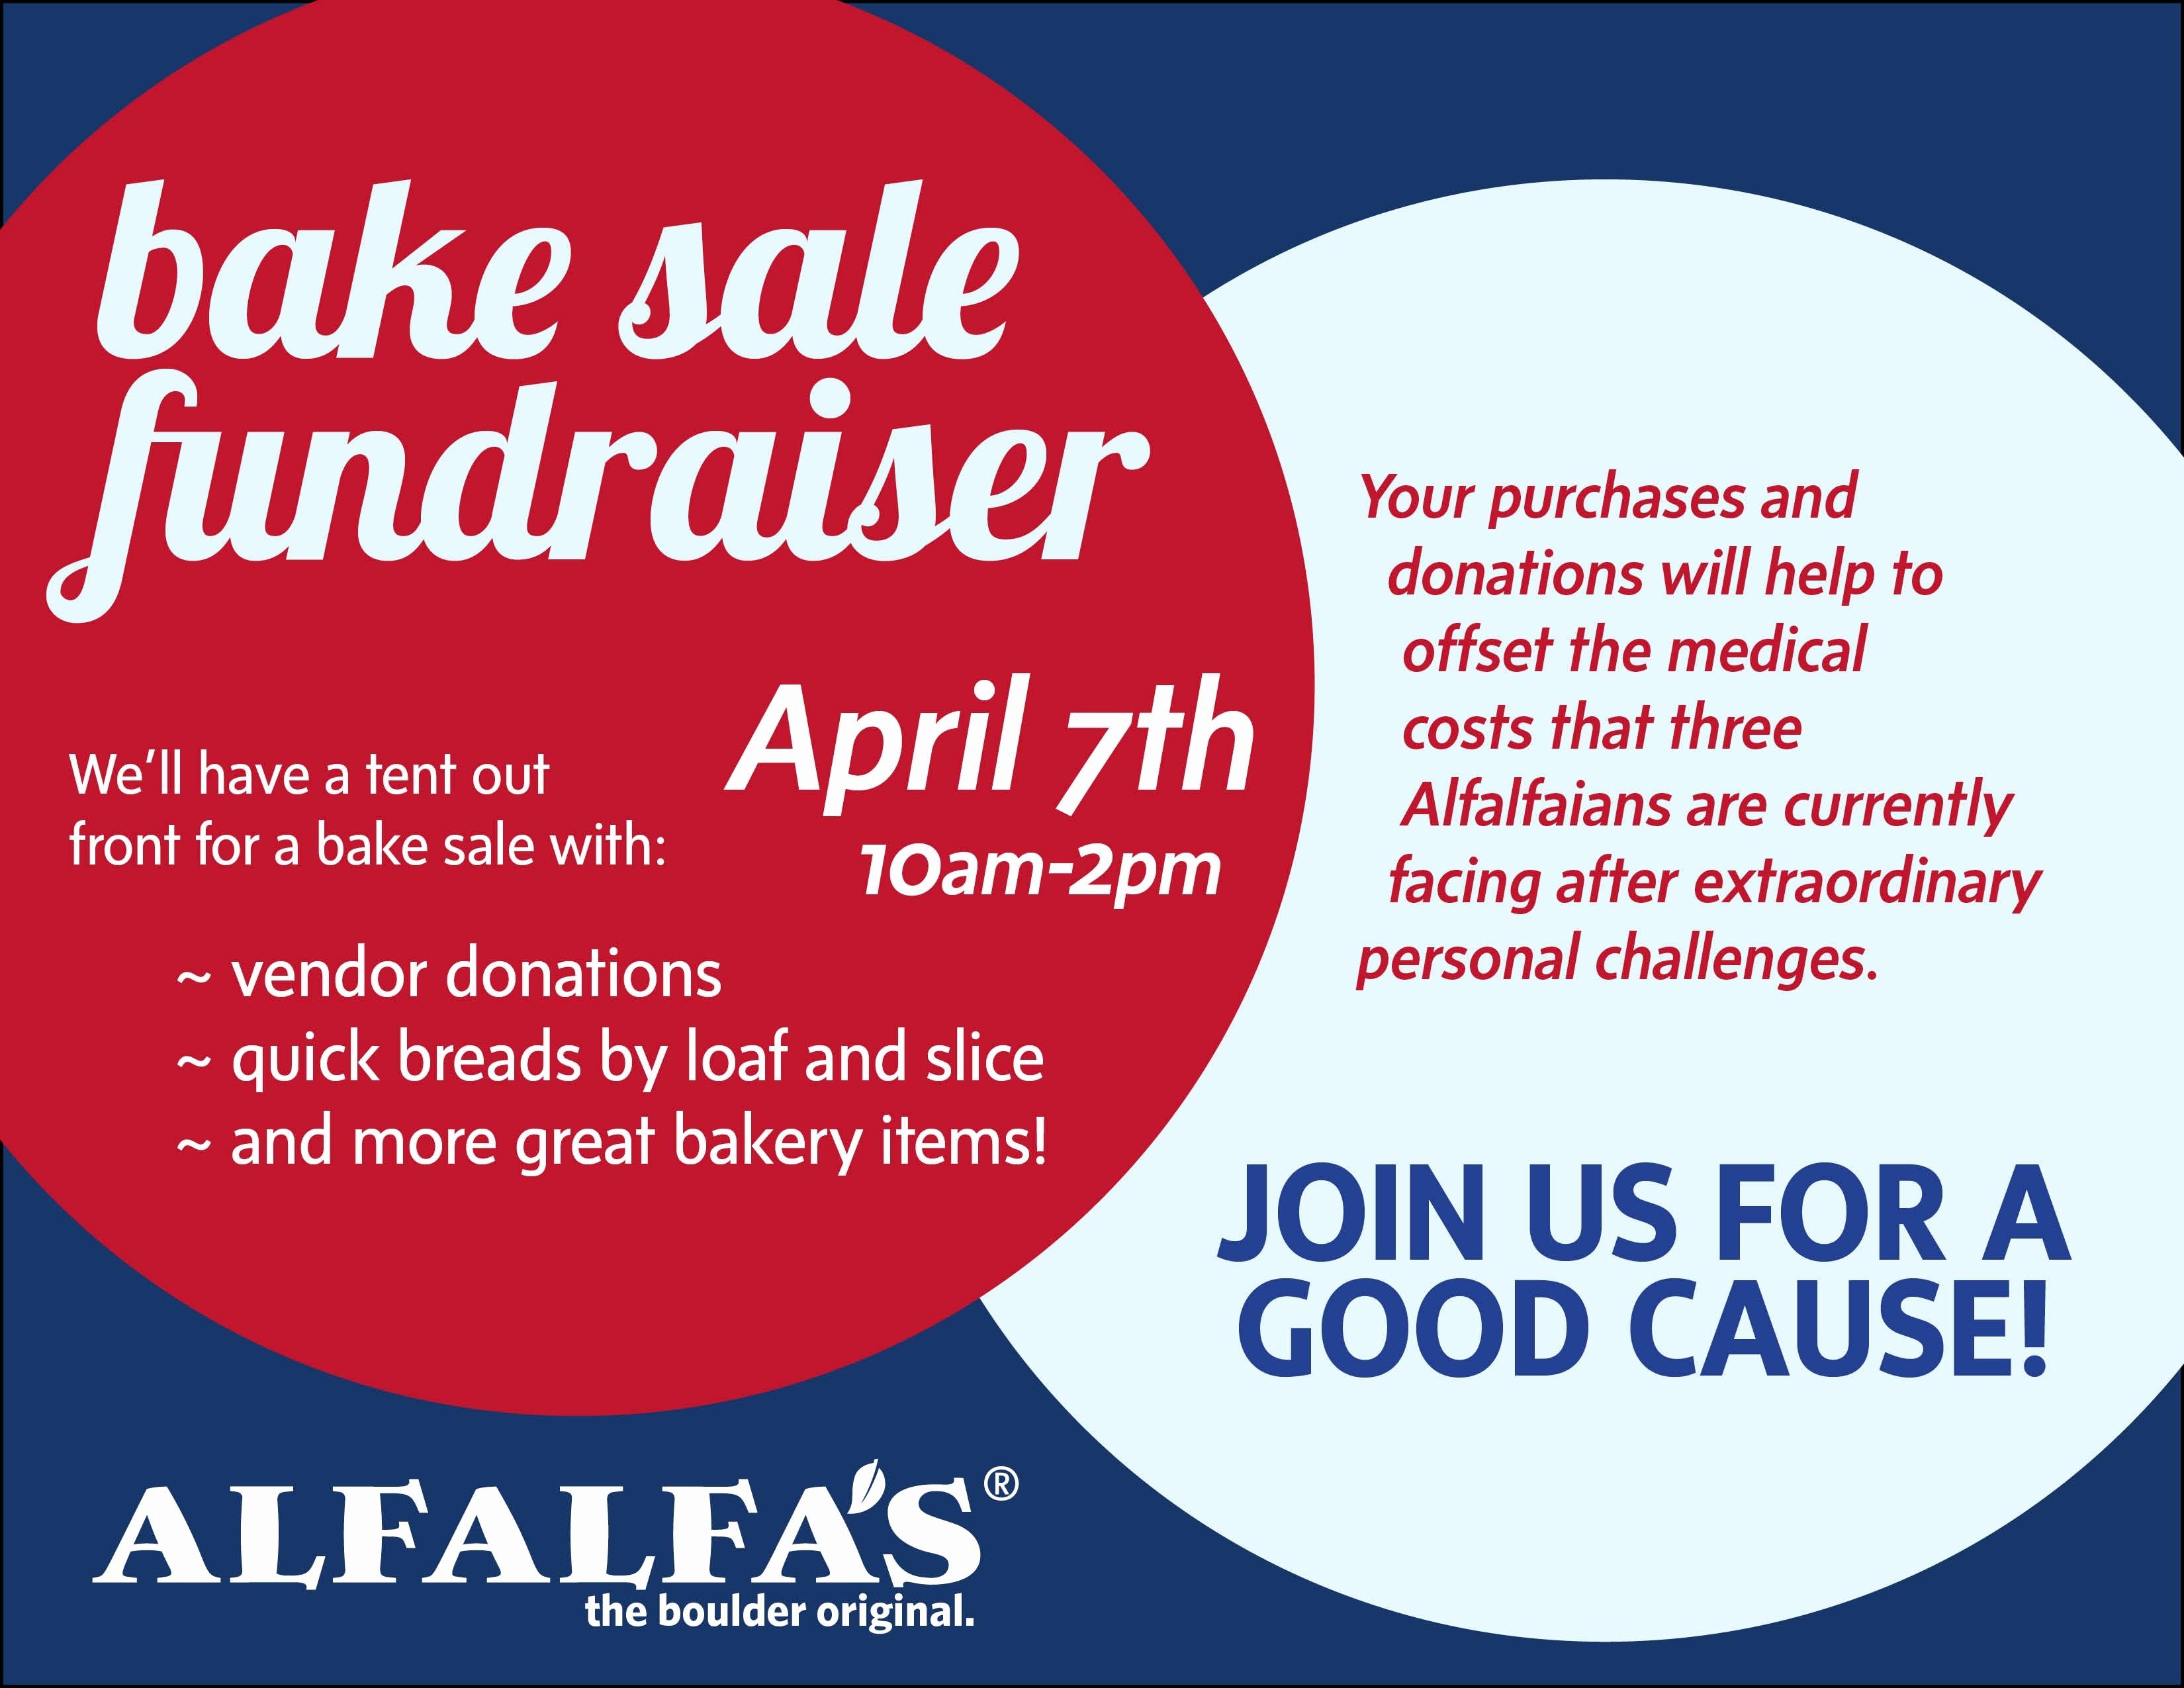 Free Printable Fundraiser Flyer Templates Best Of Holiday Donation - Free Printable Fundraiser Flyer Templates